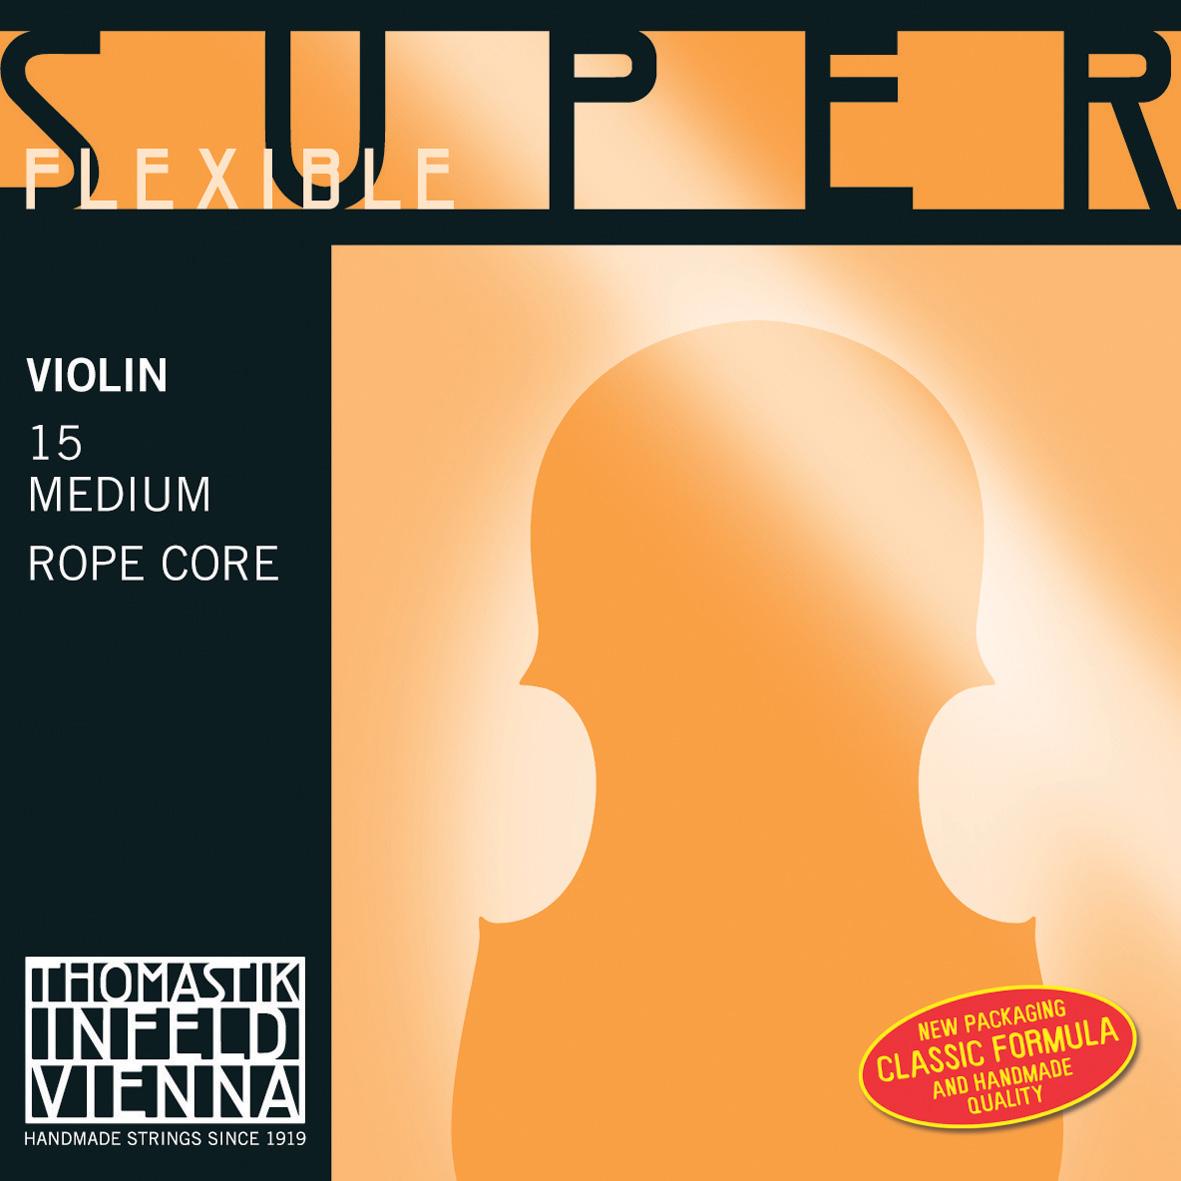 thomastik-violin-strings